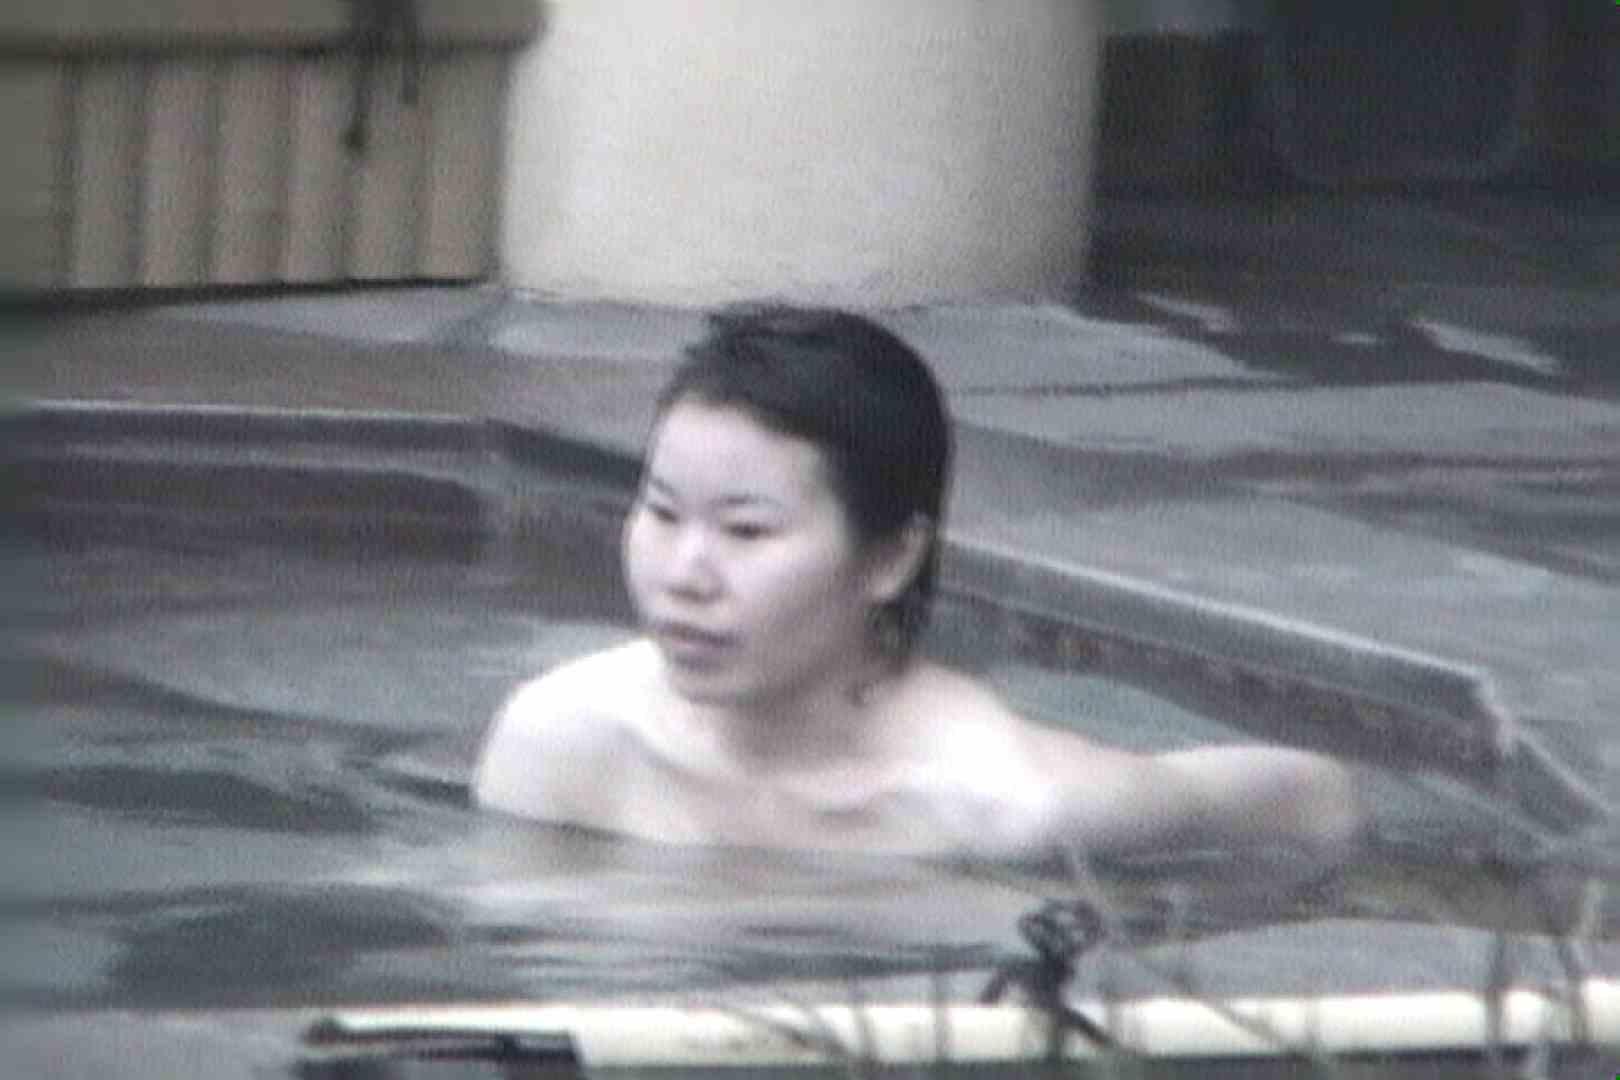 Aquaな露天風呂Vol.556 露天風呂突入 | 盗撮師作品  69pic 22